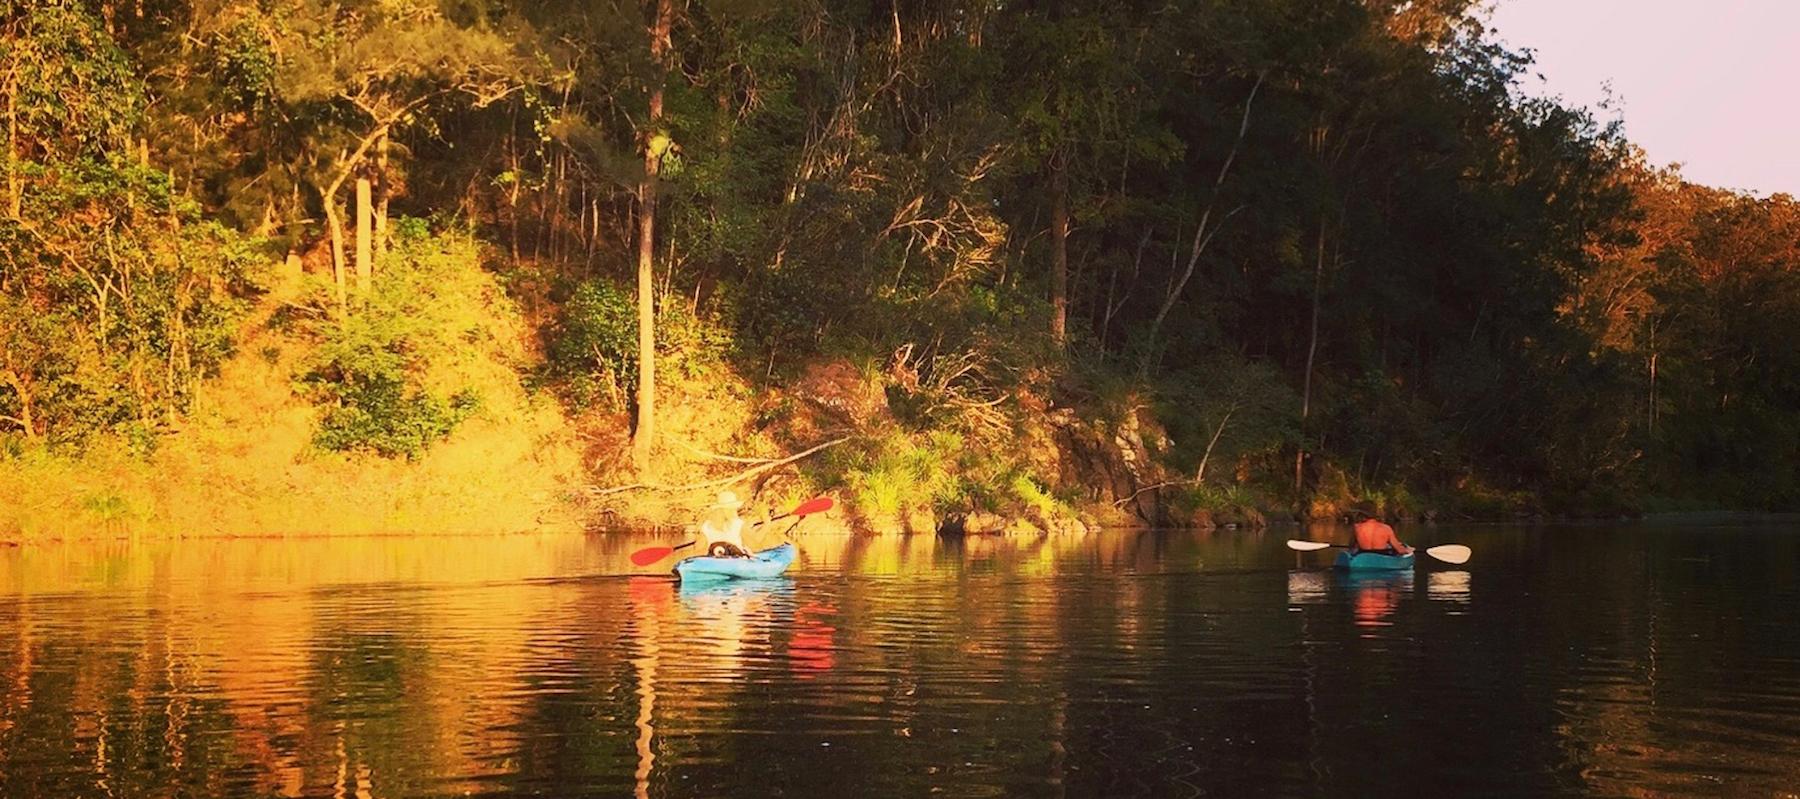 bellinger river kayaking, moo river farm, bellingen activities, bellingen holiday accommodation, bellingen farmstay, moo river farm, bellingen cottage